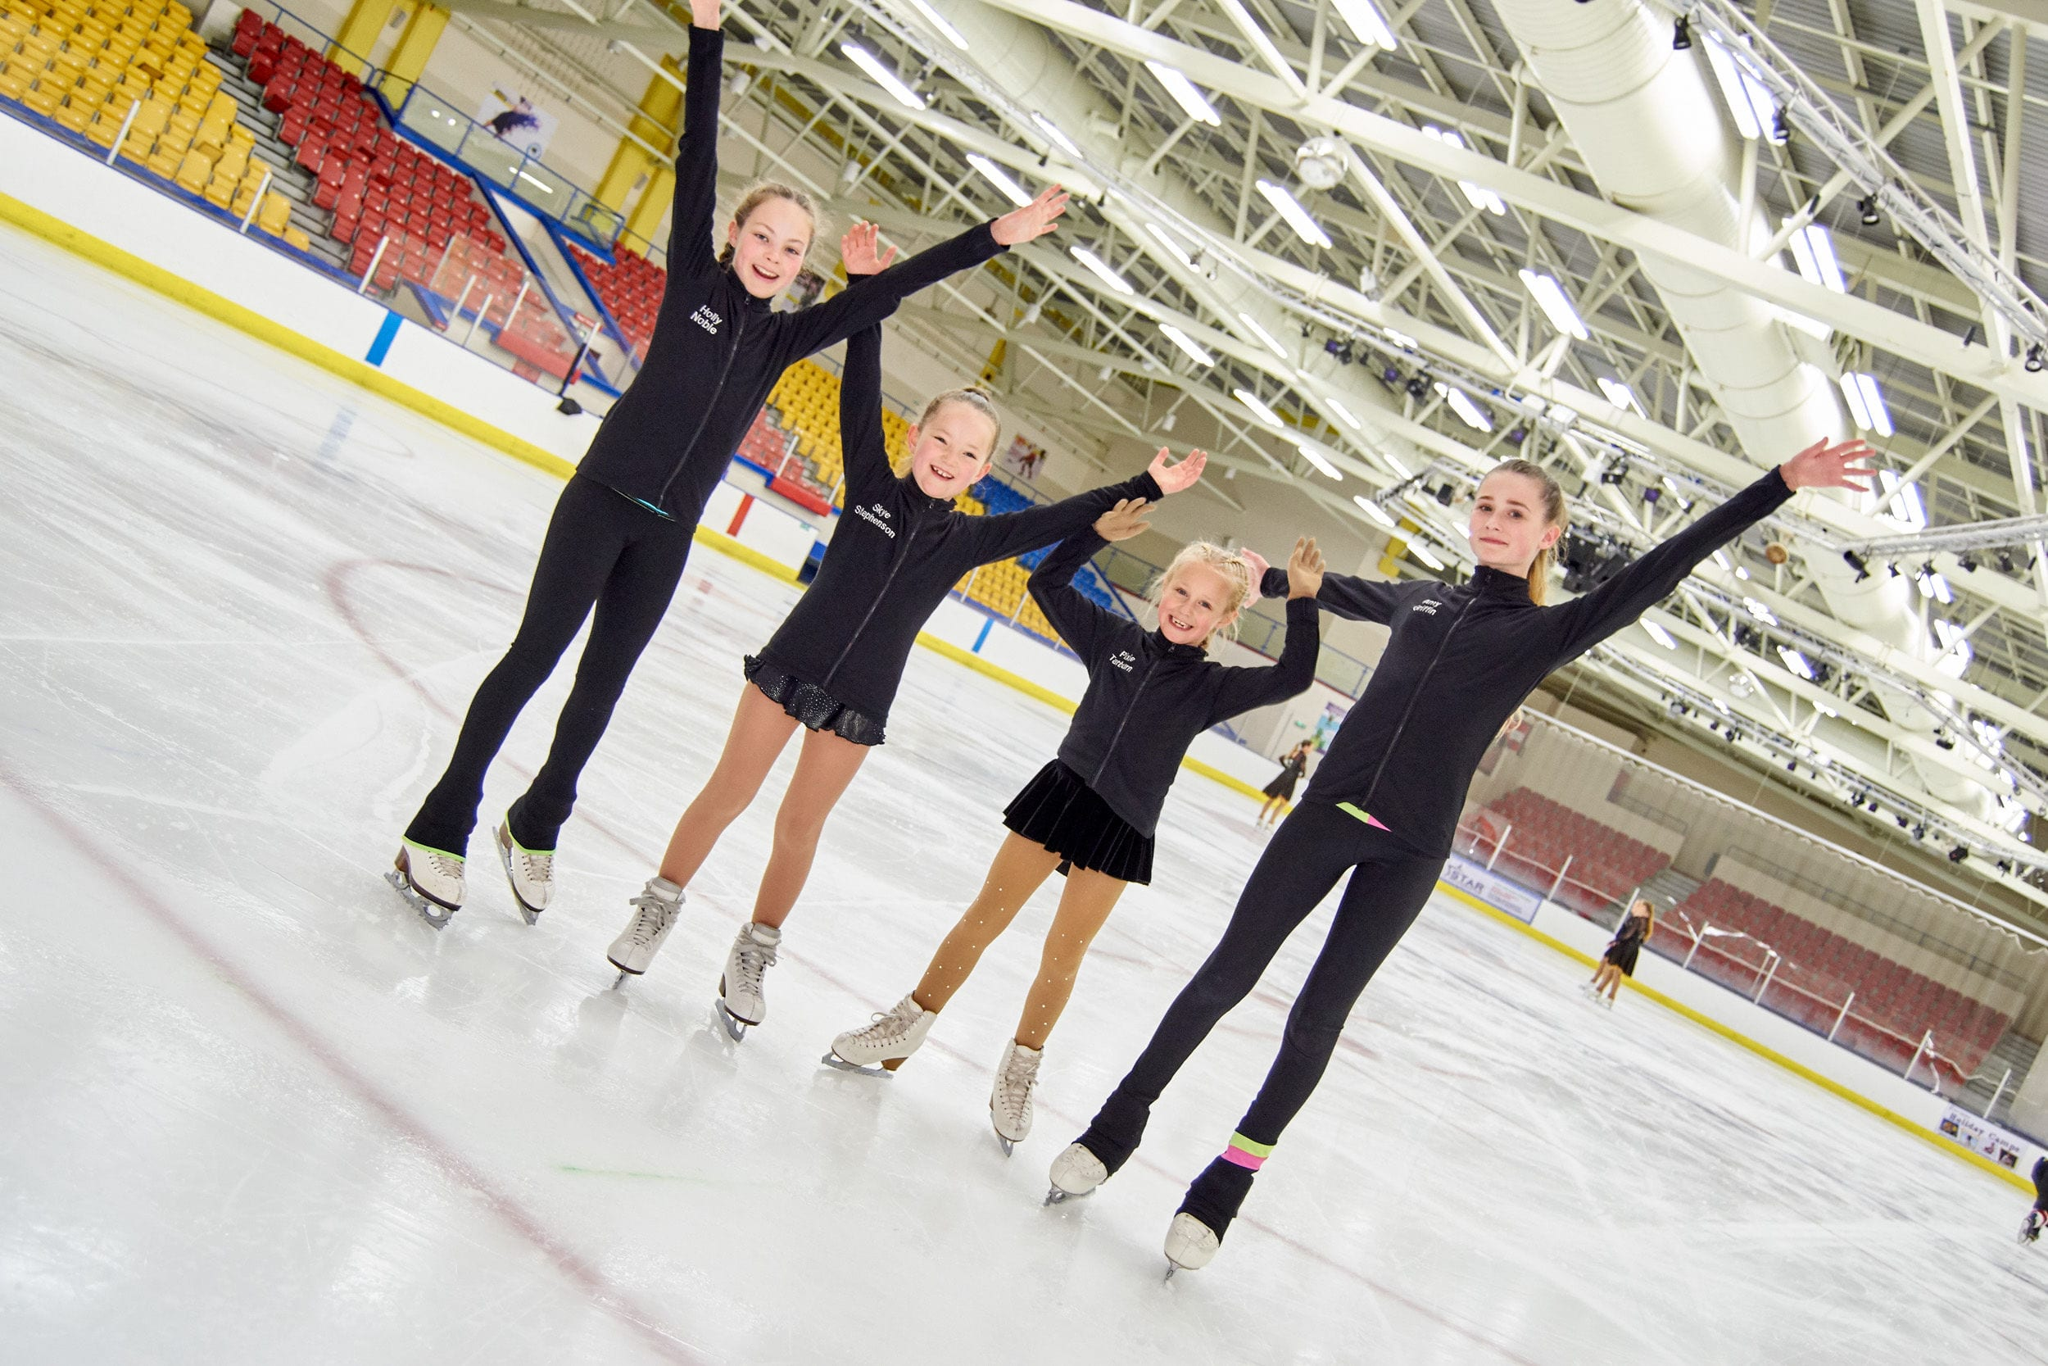 Linx Ice Arena